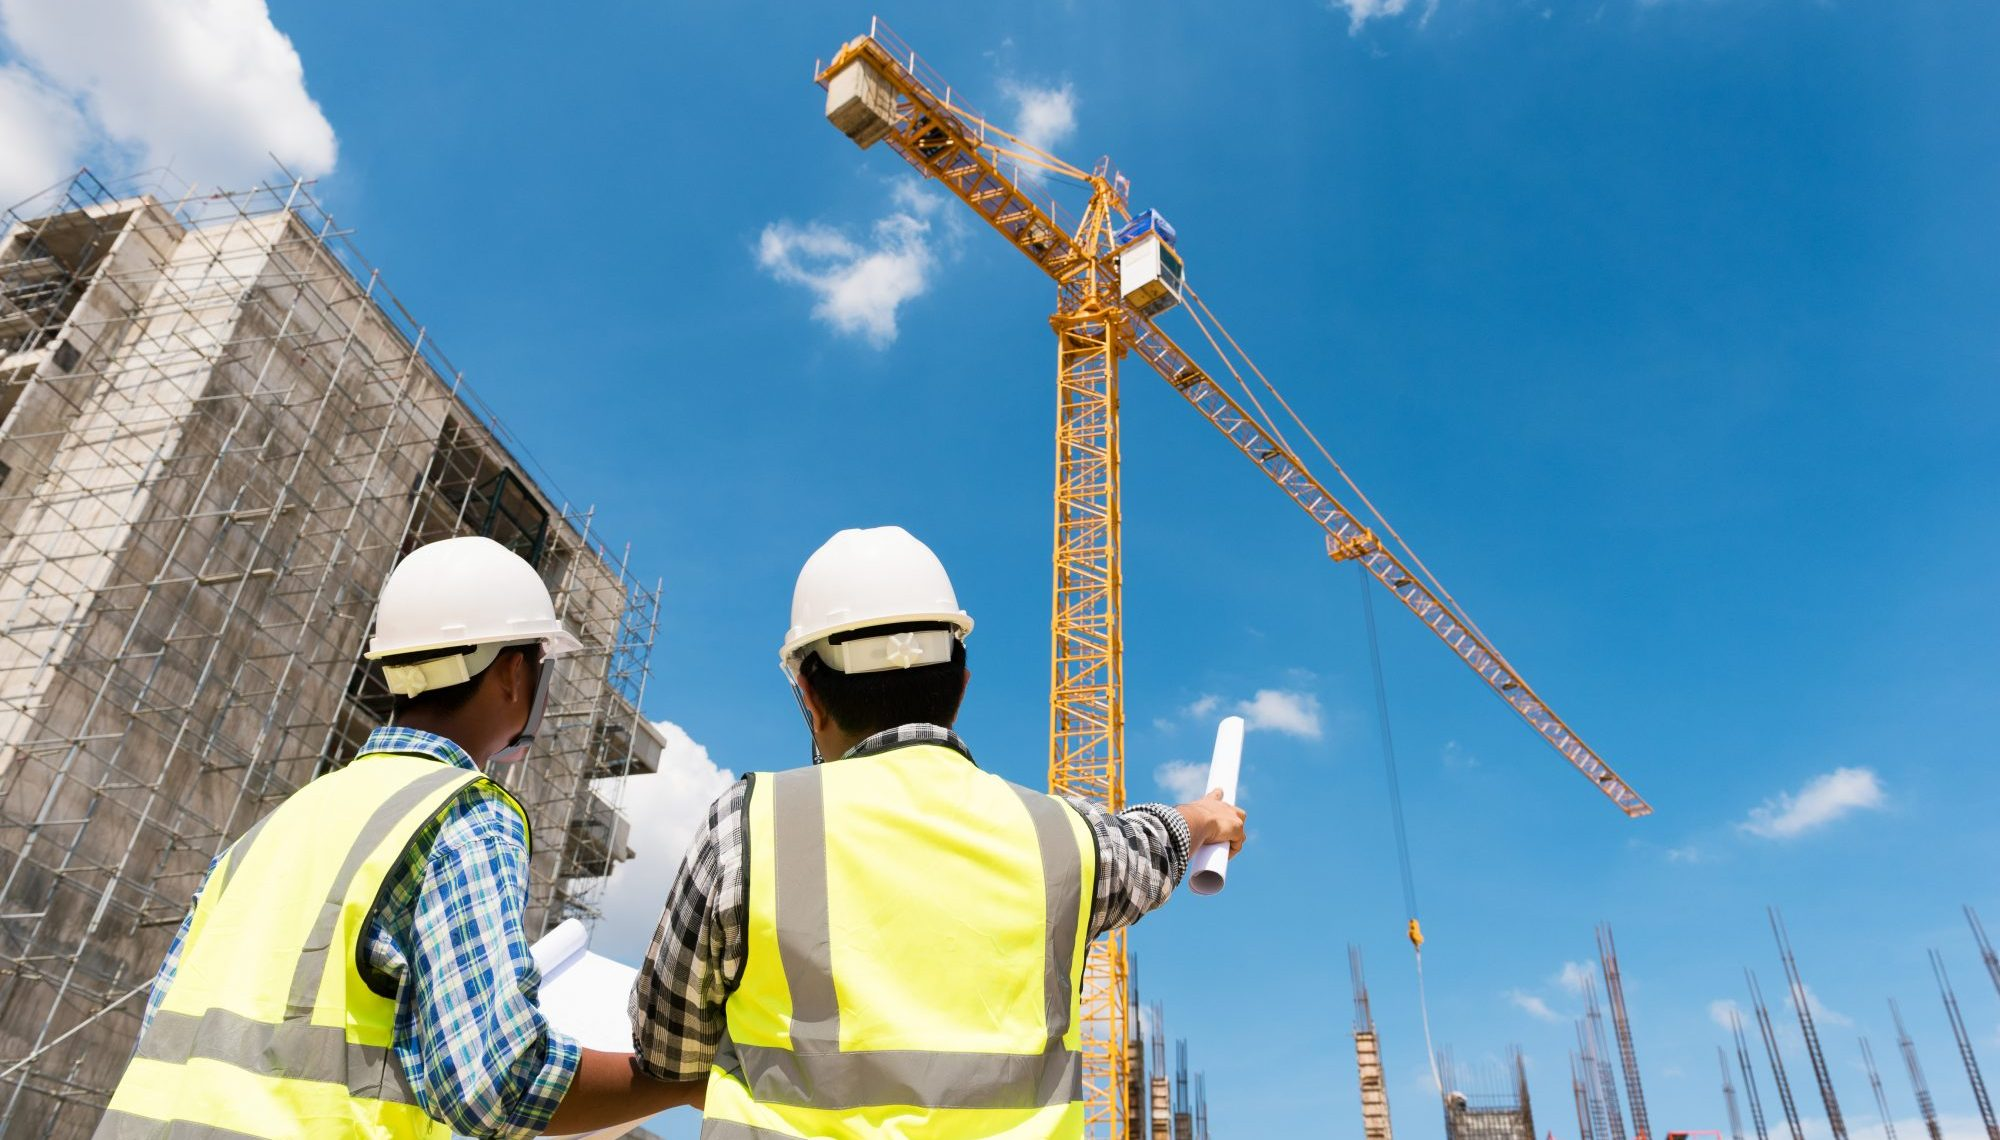 william rutledge construction engineer - HD1500×1001